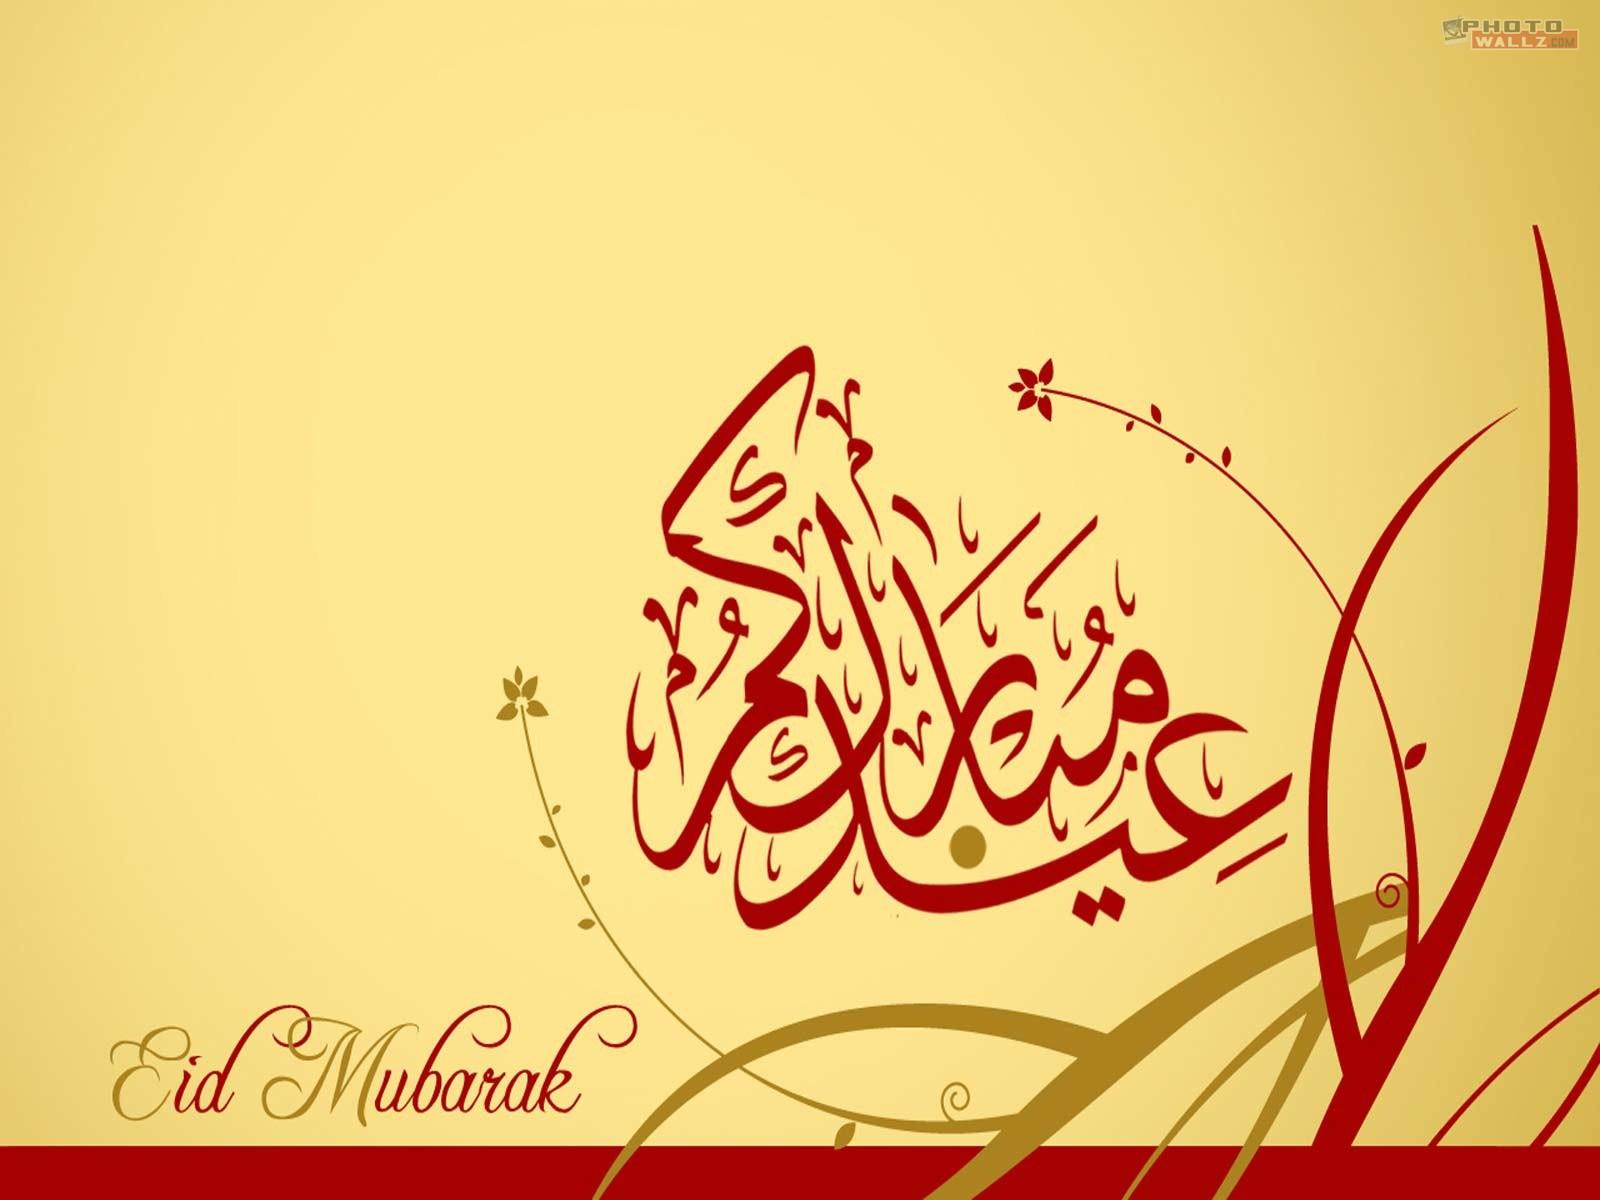 Media review network eid mubarak eid mubarak wishes in arabic 1 m4hsunfo Images